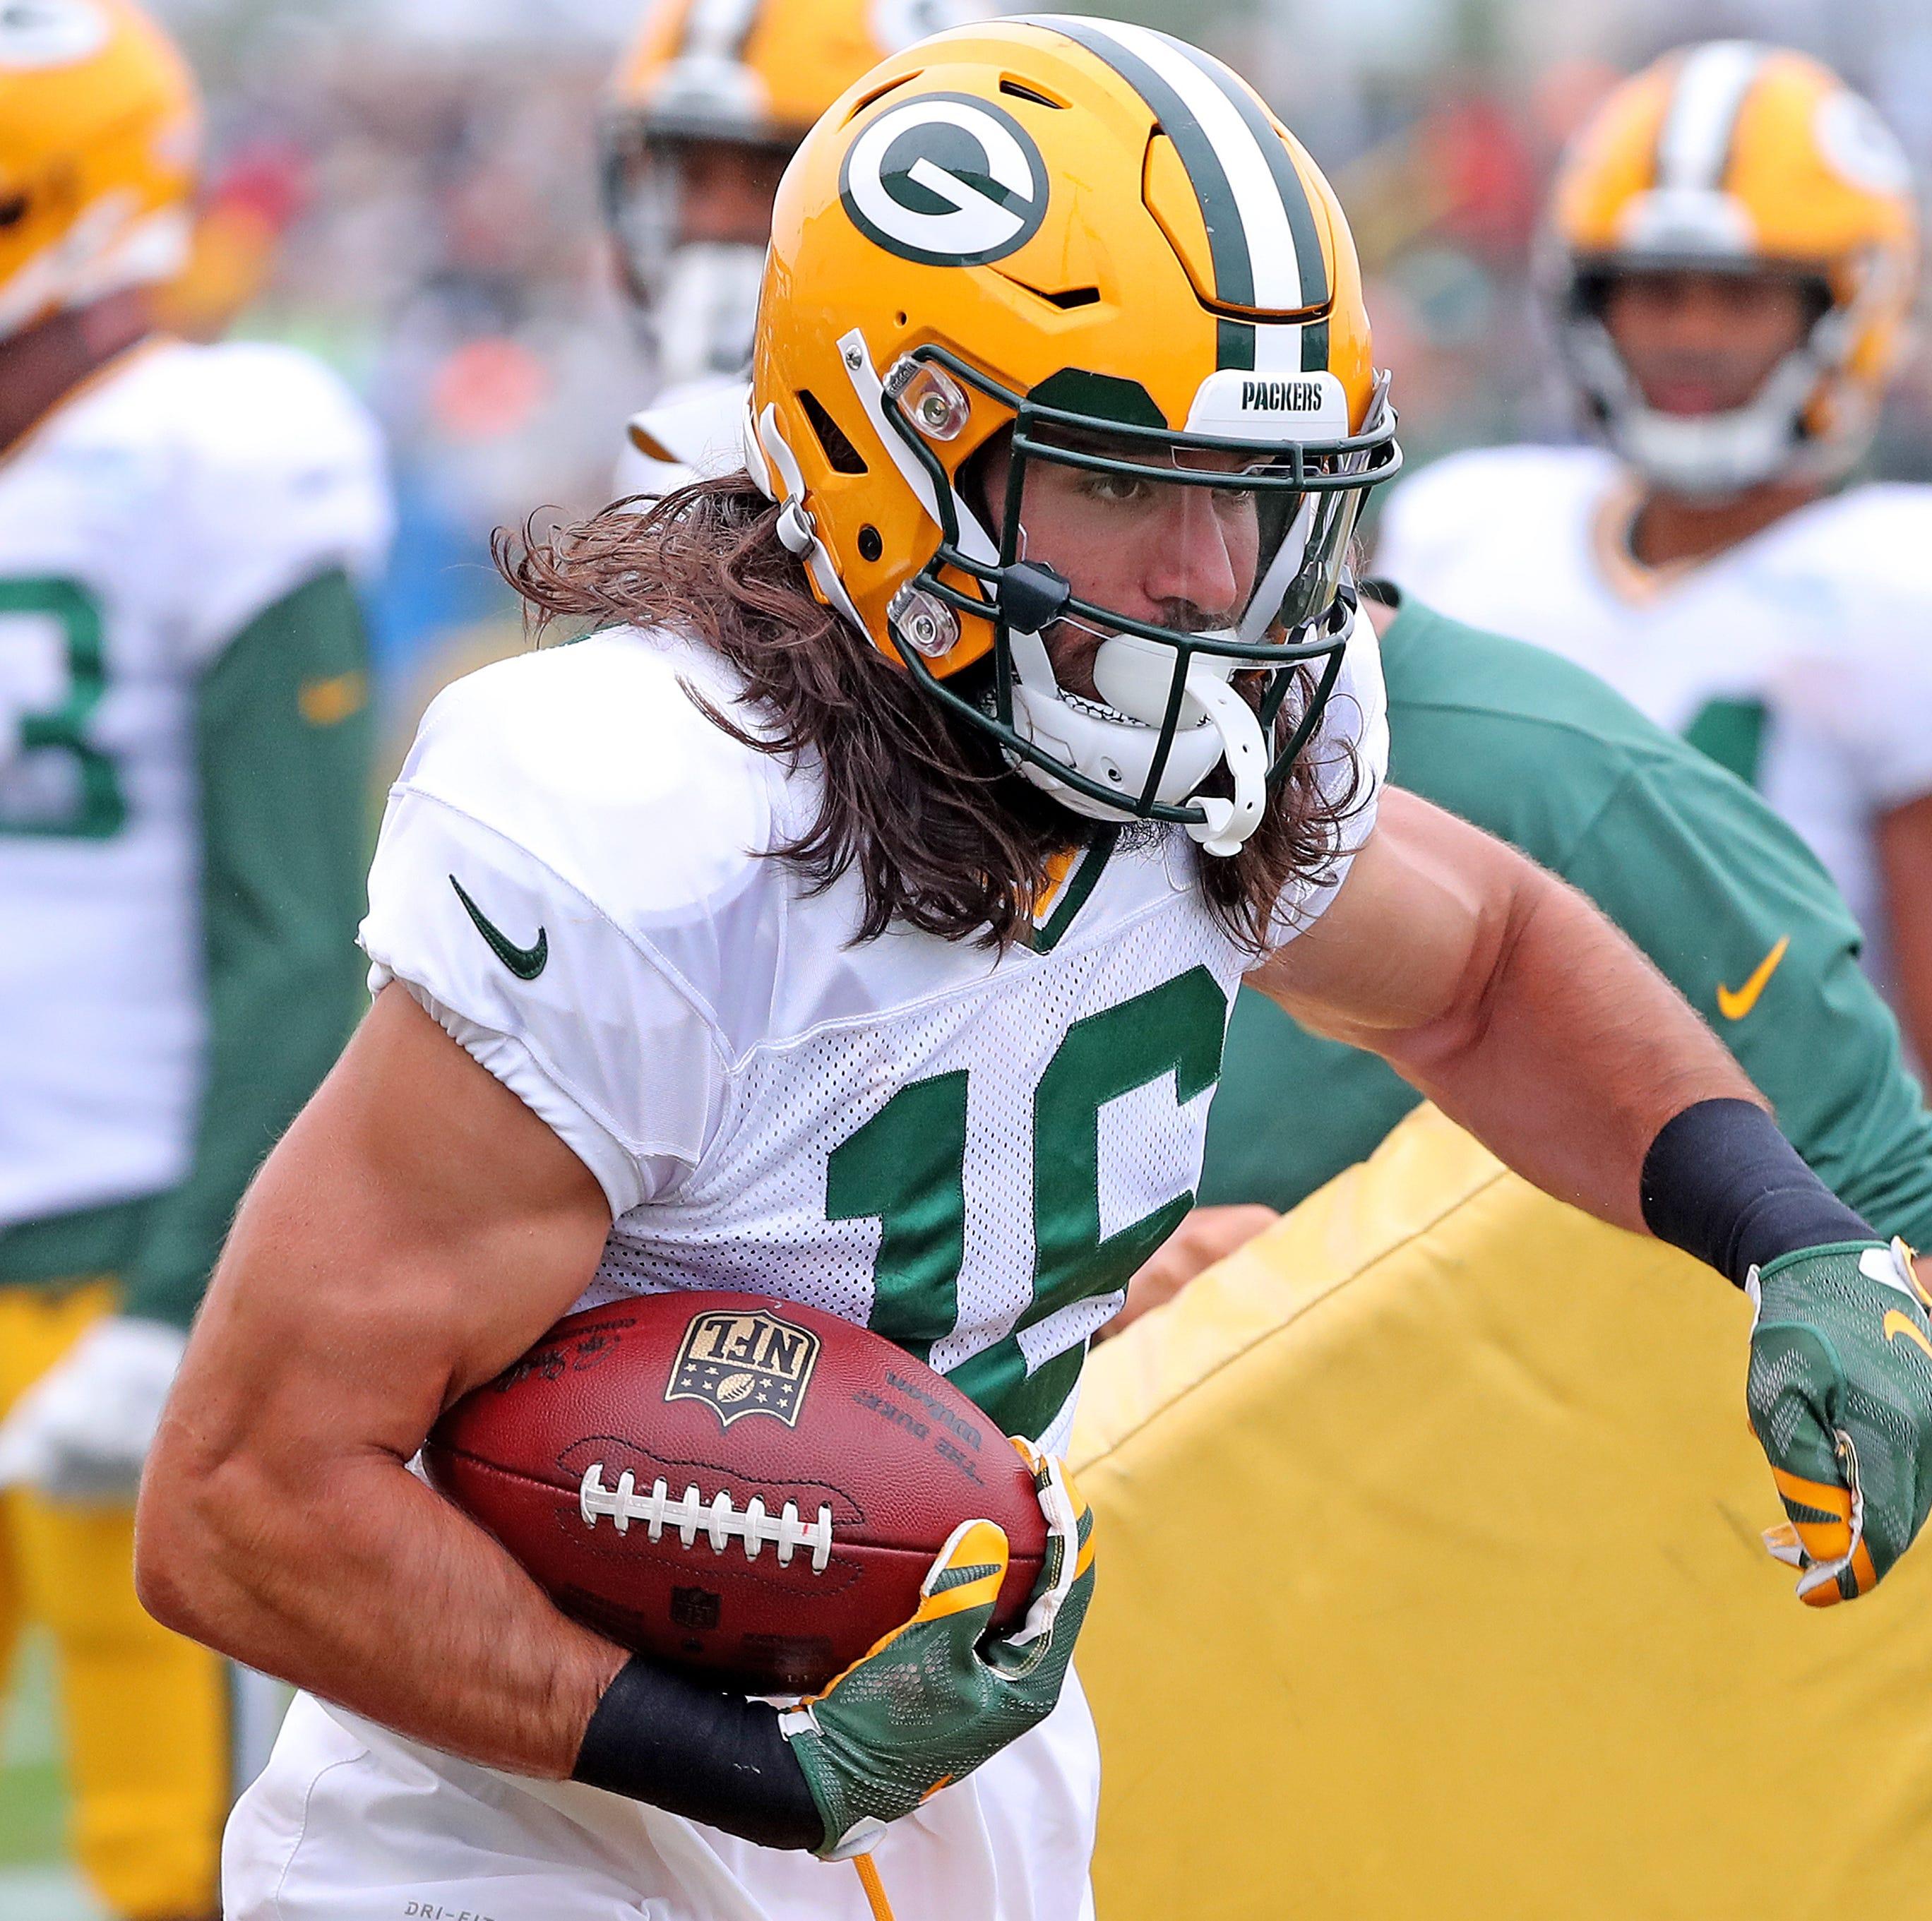 Packers GM Brian Gutekunst's interest in WR Jake Kumerow goes back years